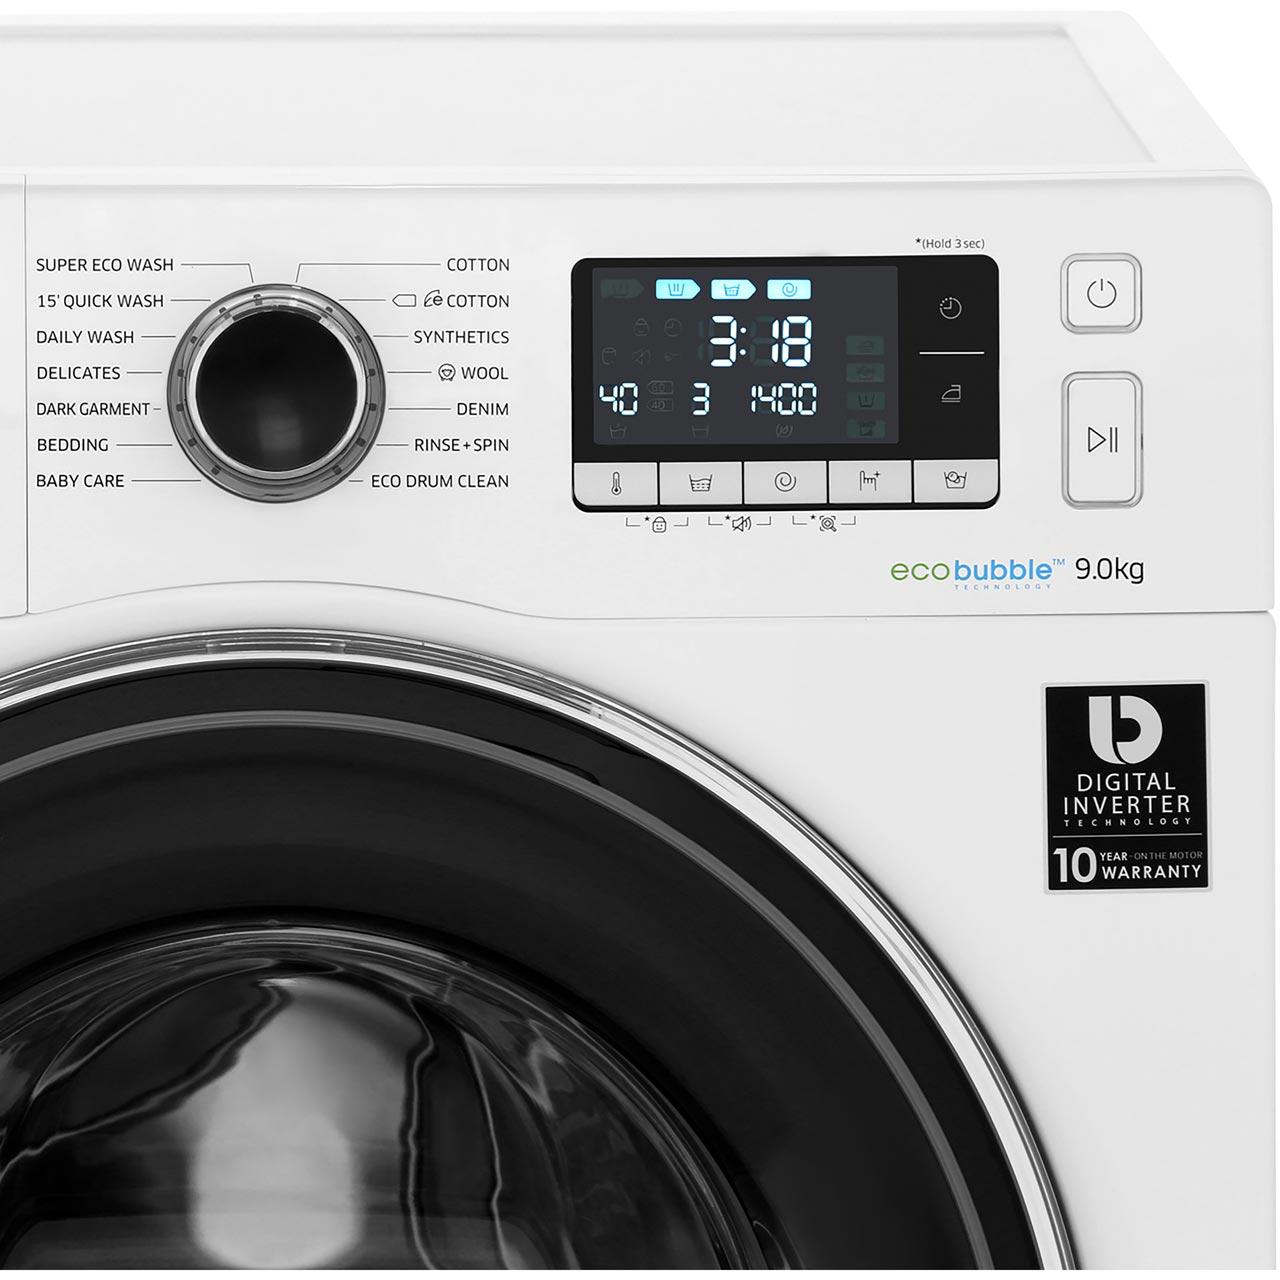 Samsung ecobubble™ WW90J5456FW Washing Machine - White